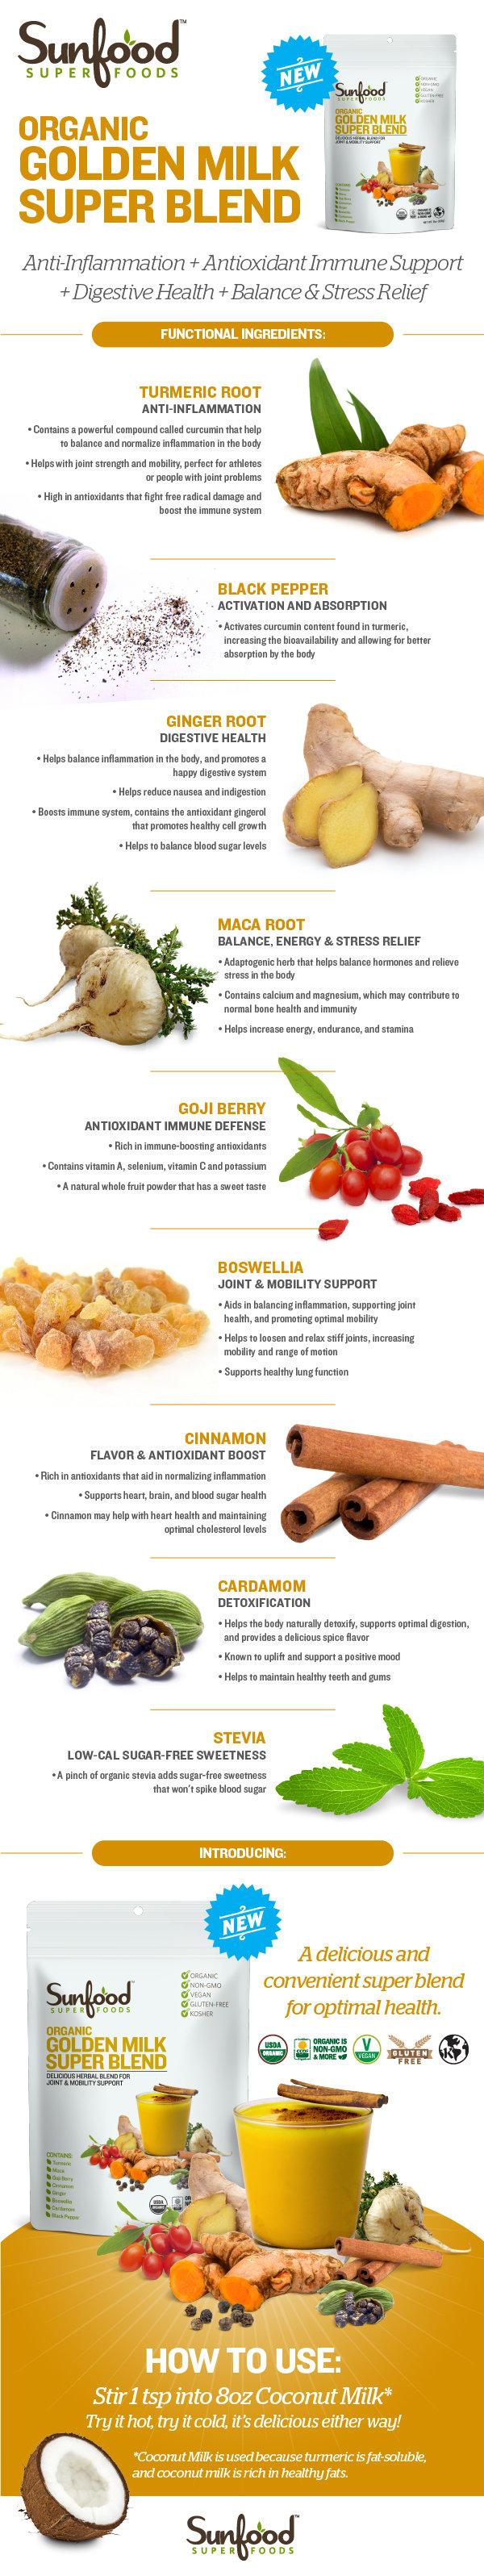 Golden-Milk-Super-Blend-infographic.jpg